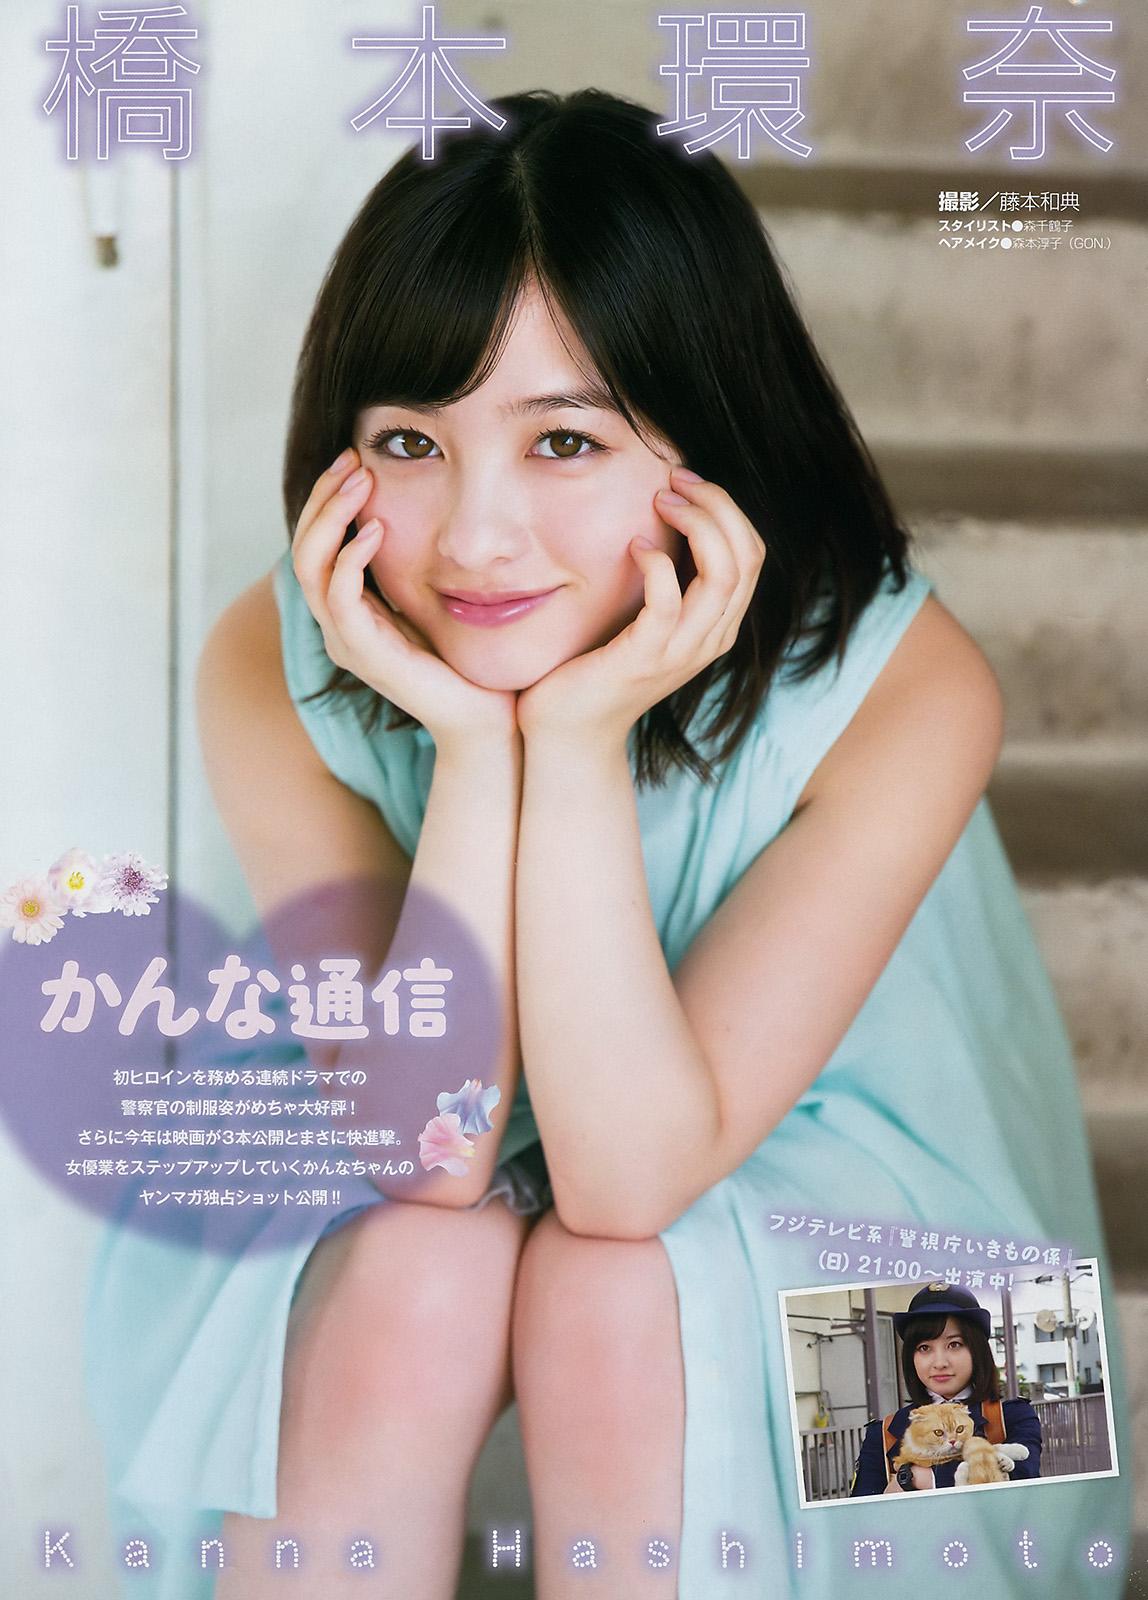 Hashimoto Kanna 橋本環奈, Young Magazine 2017 No.39 (週刊ヤングマガジン 2017年39号)